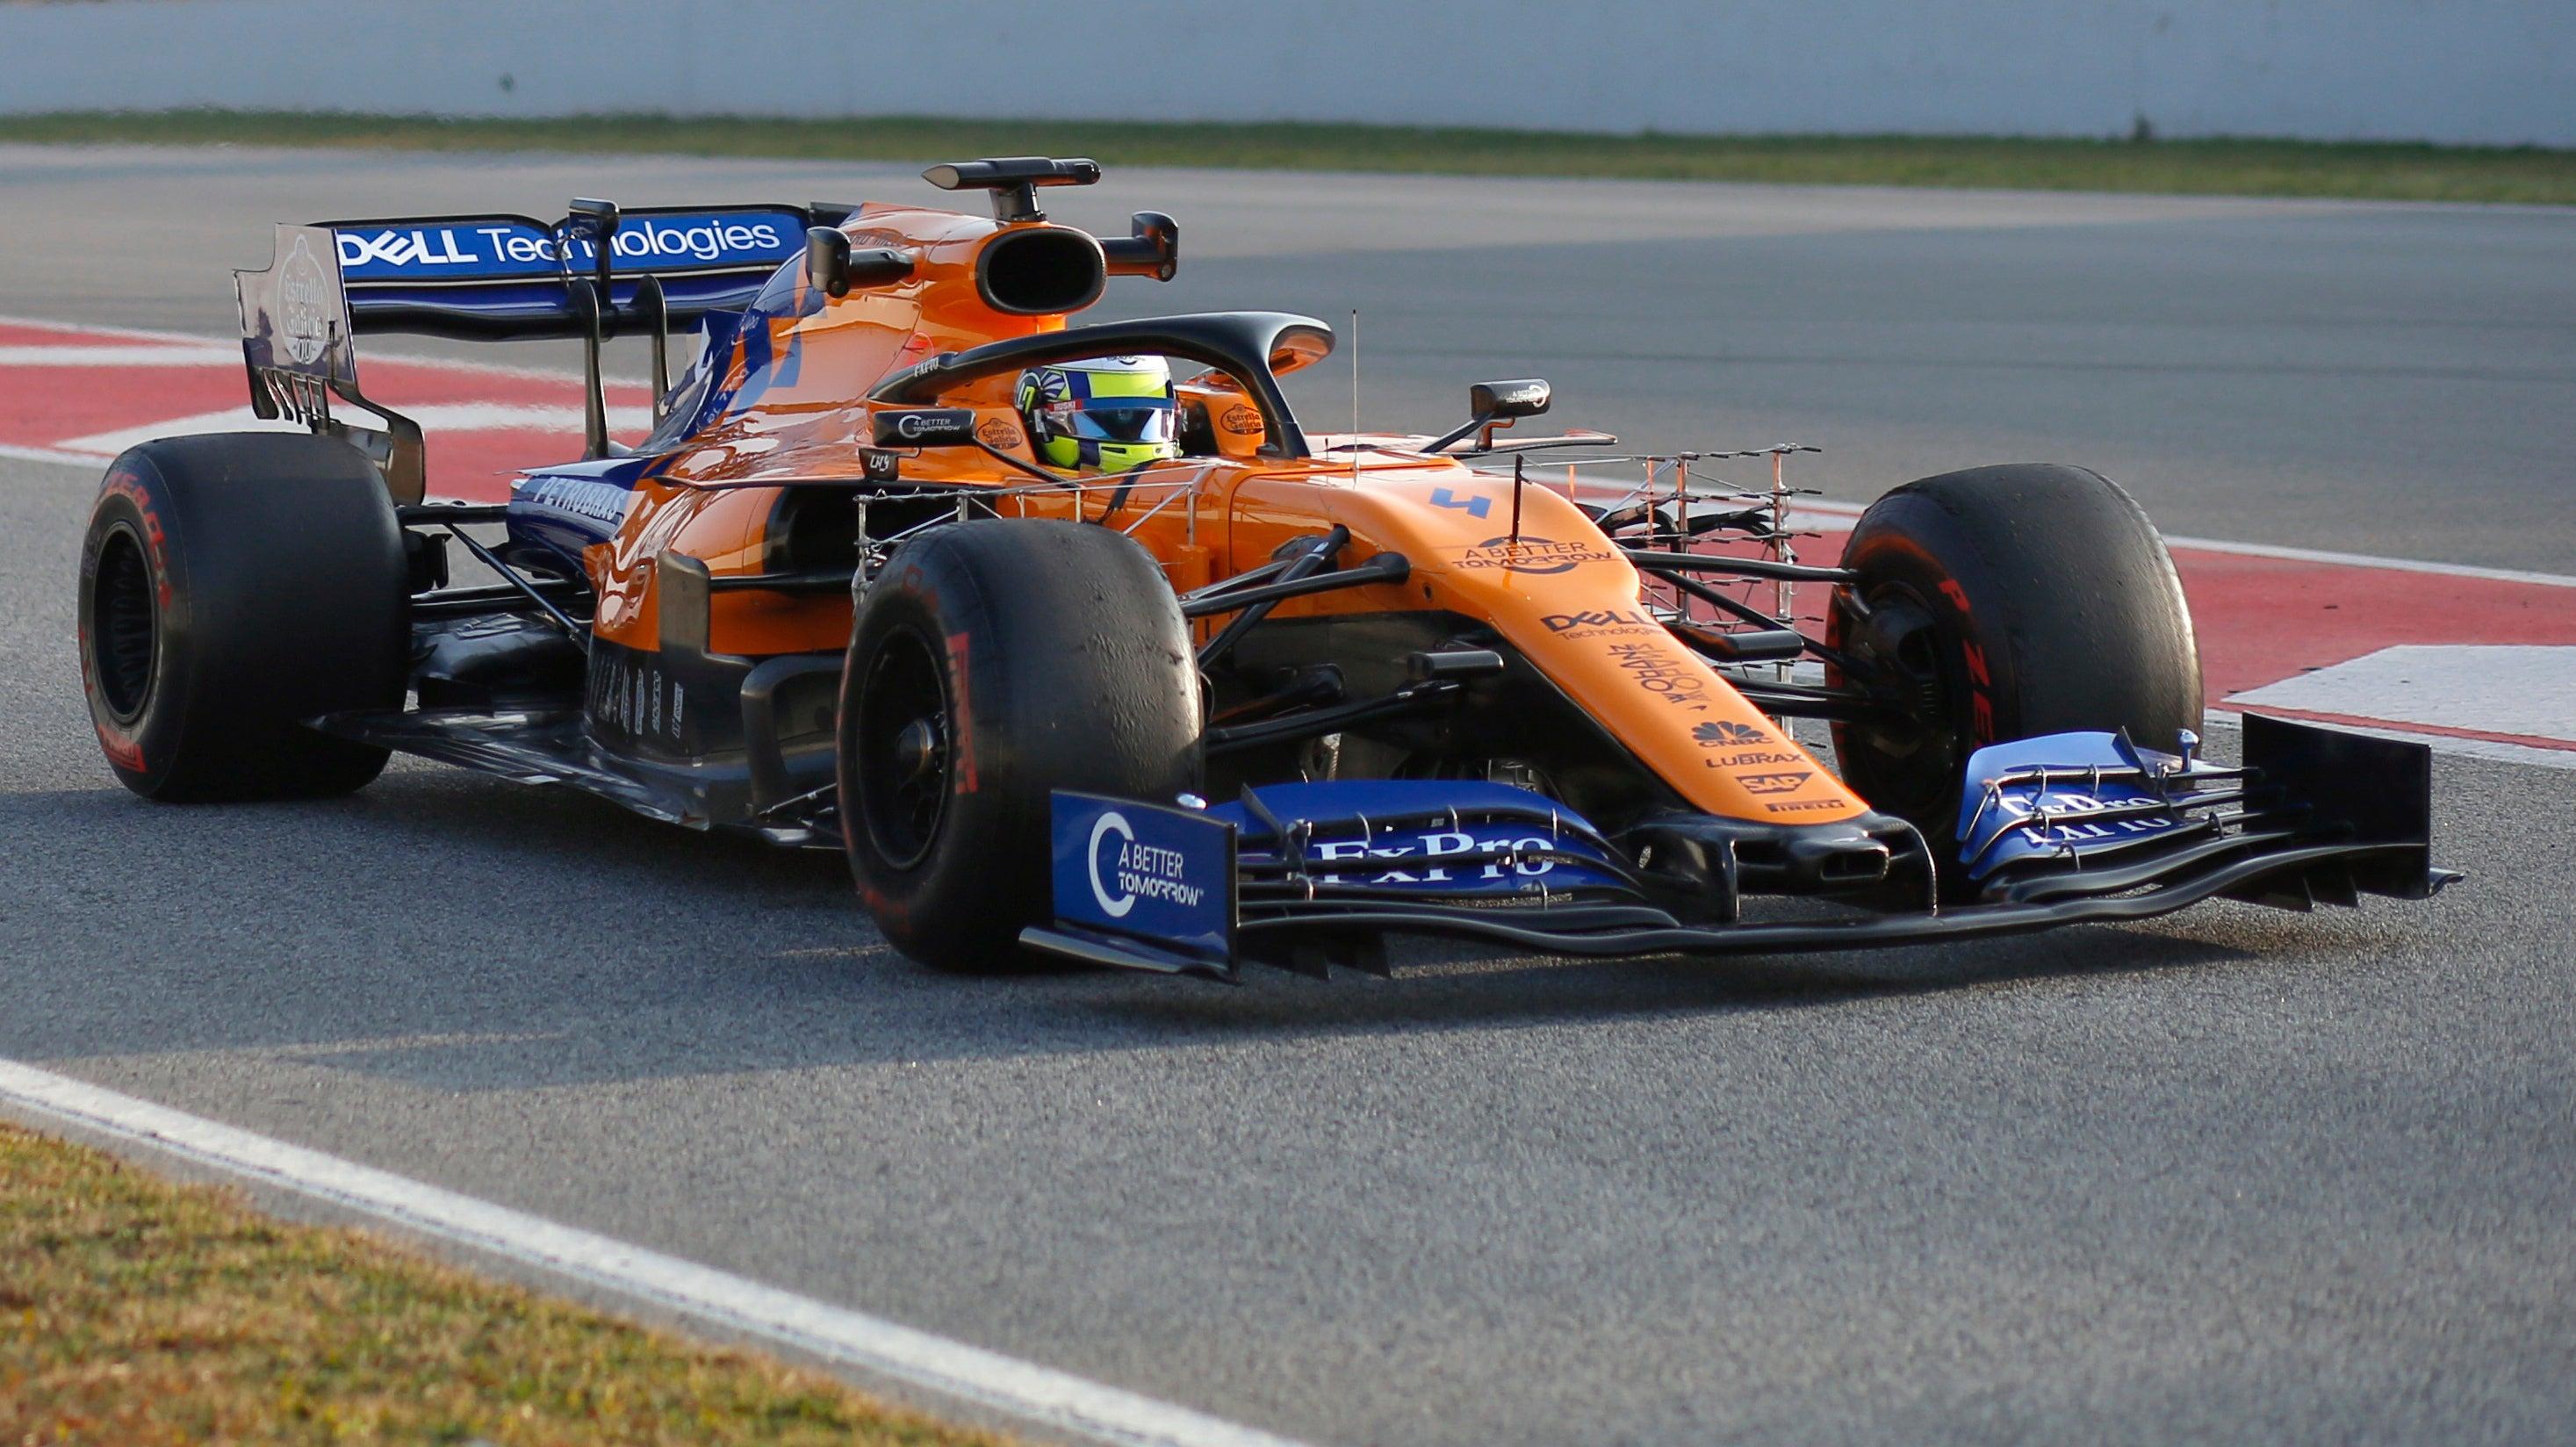 McLaren's Formula One Season Is In Flames Already